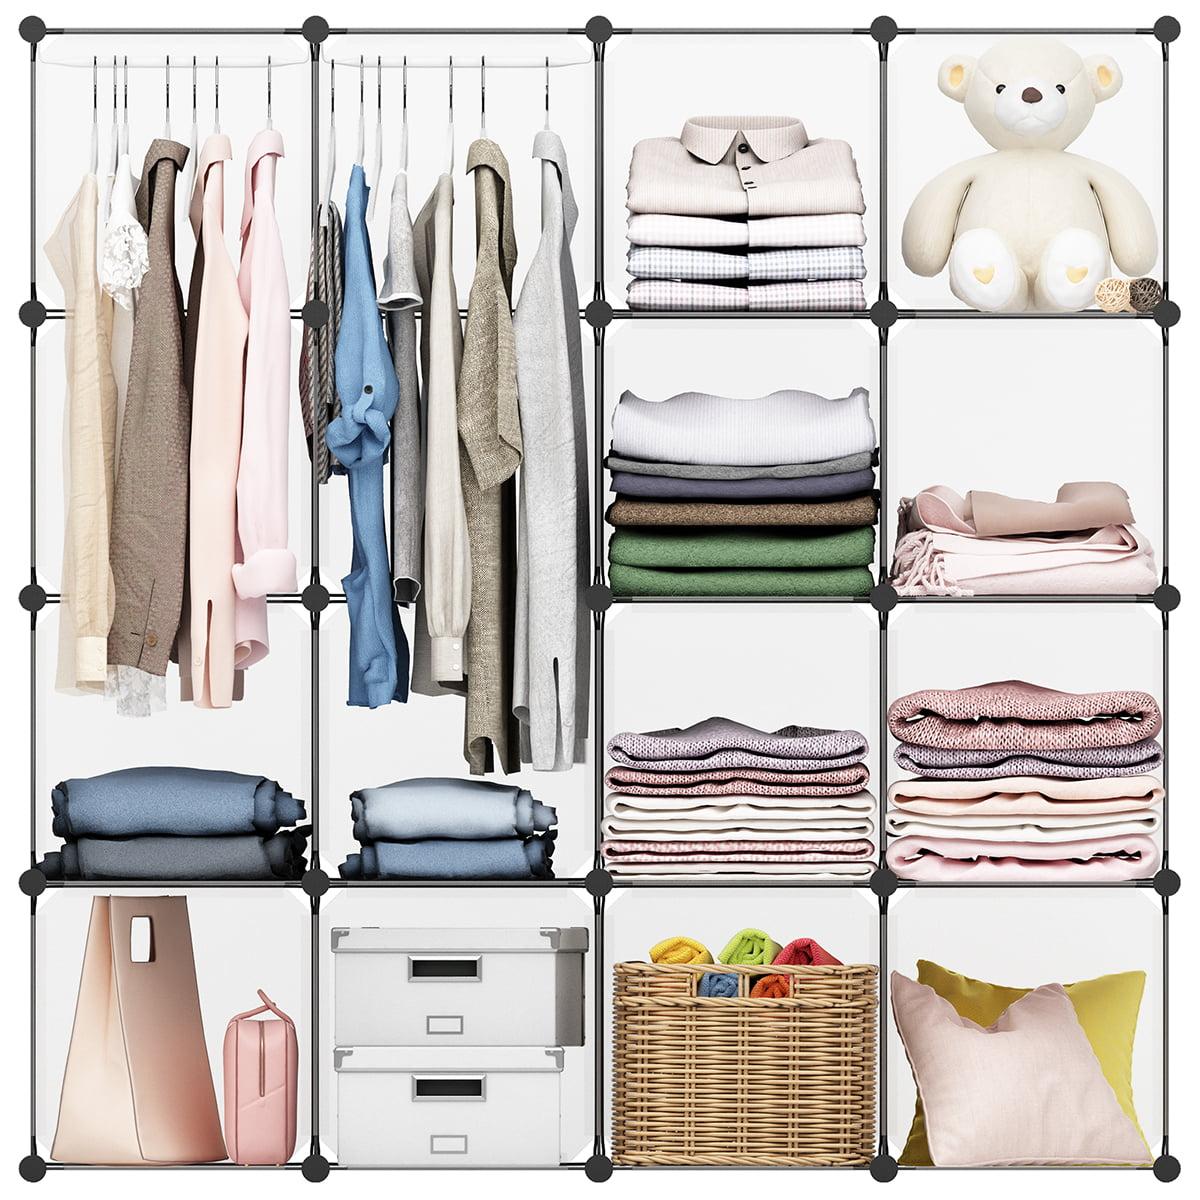 LANGRIA 16-cube Modular Clothes Shelving Storage Organizer DIY Plastic Shoe Rack Cabinet Translucent, White